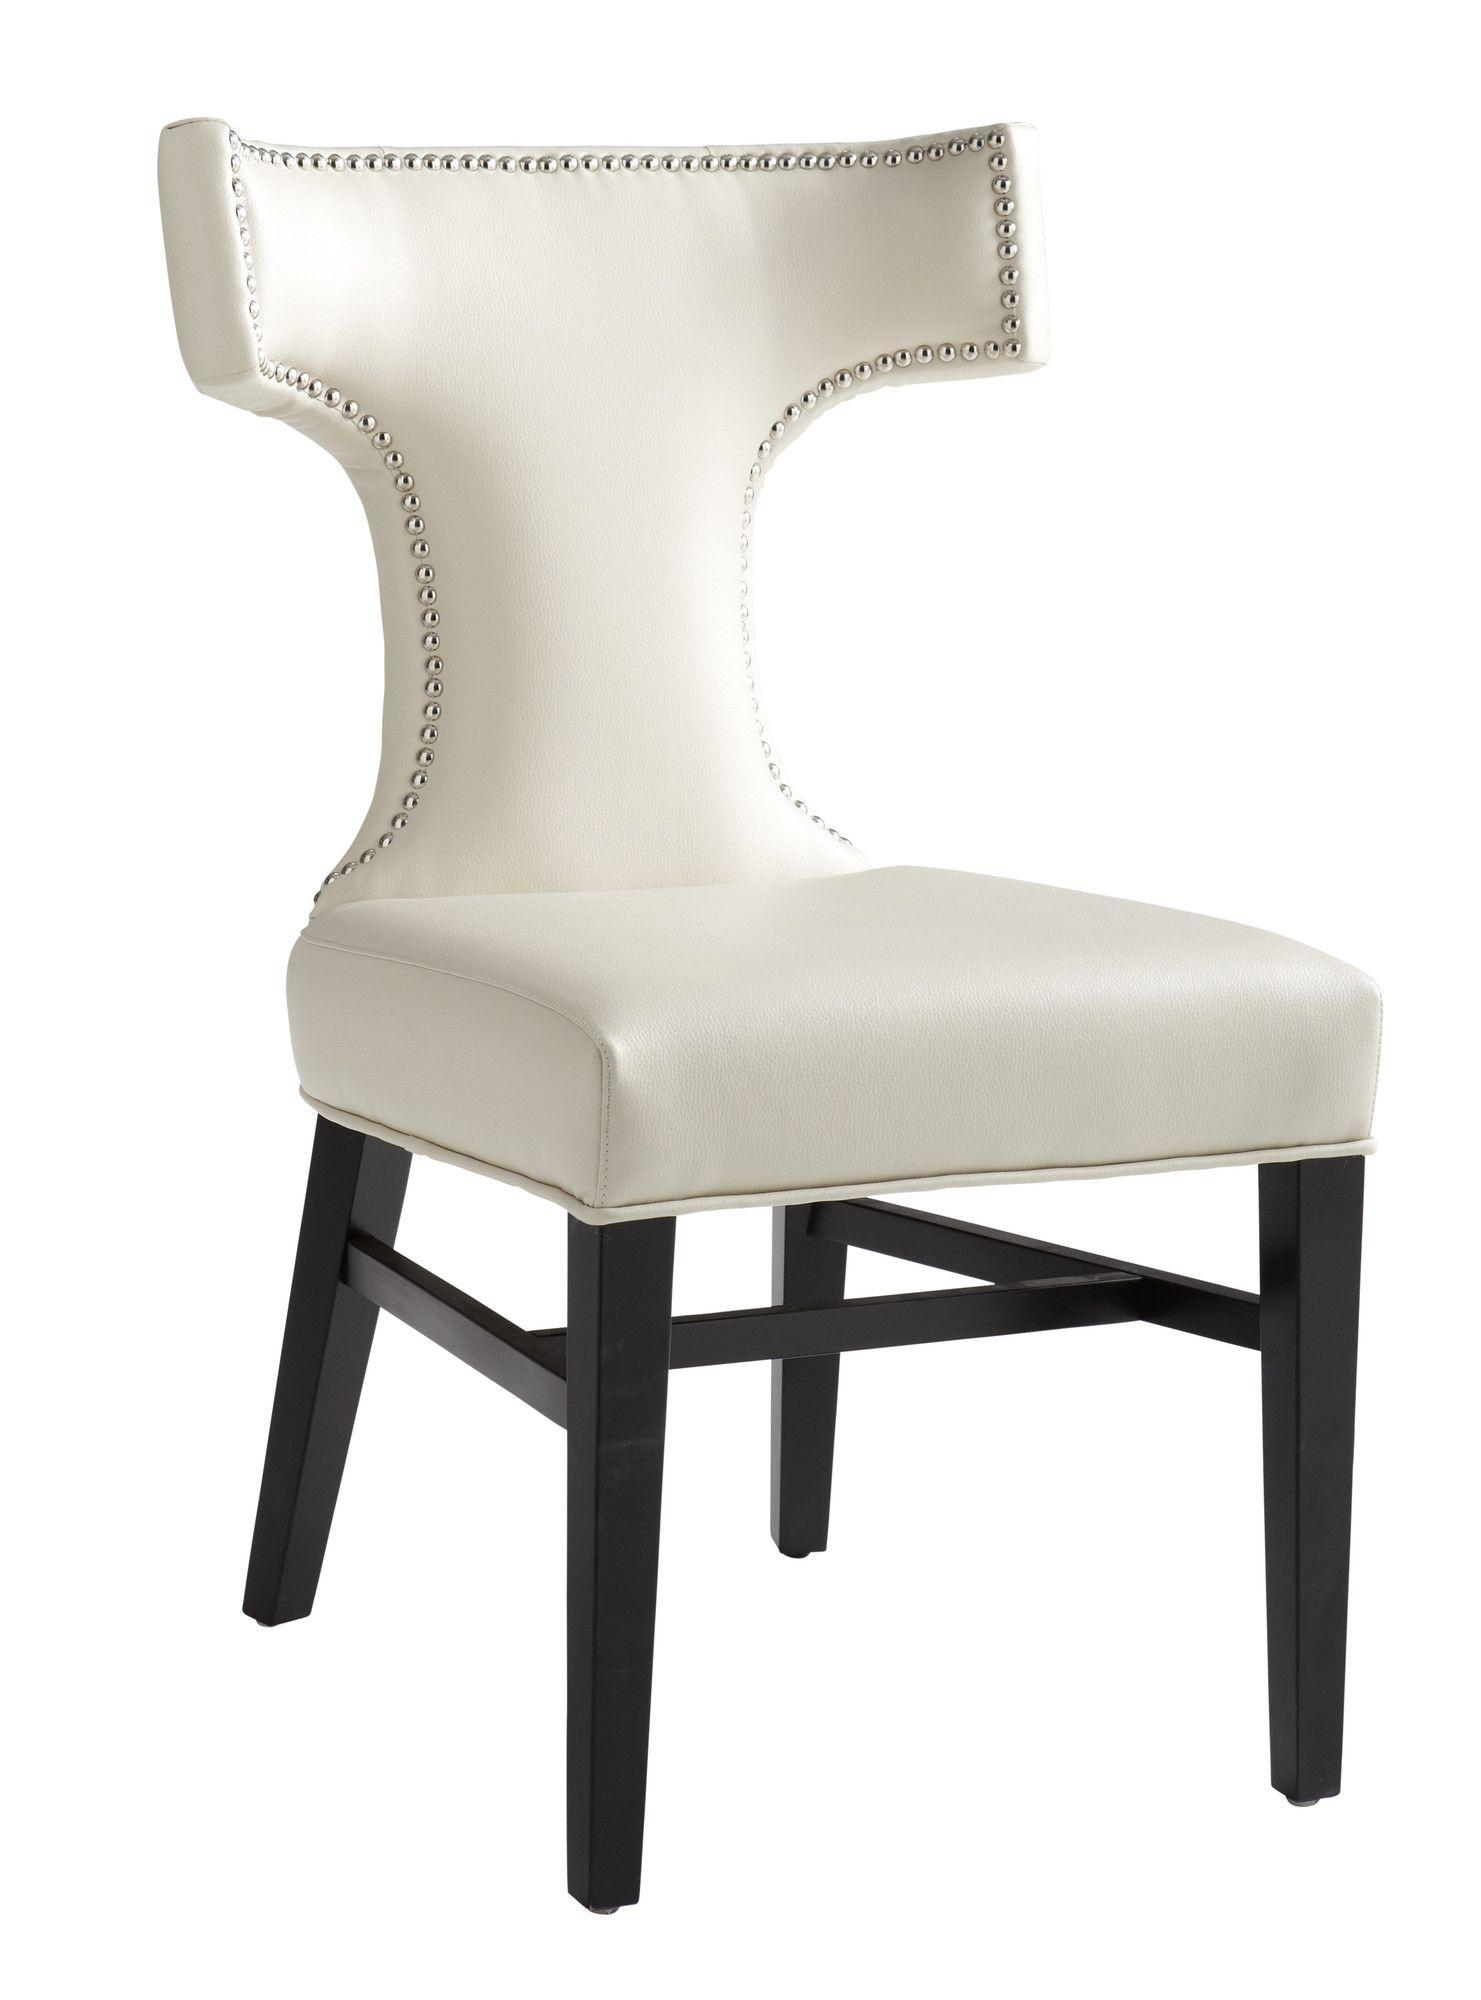 5West Serafina Parsons Chair (Set of 2)